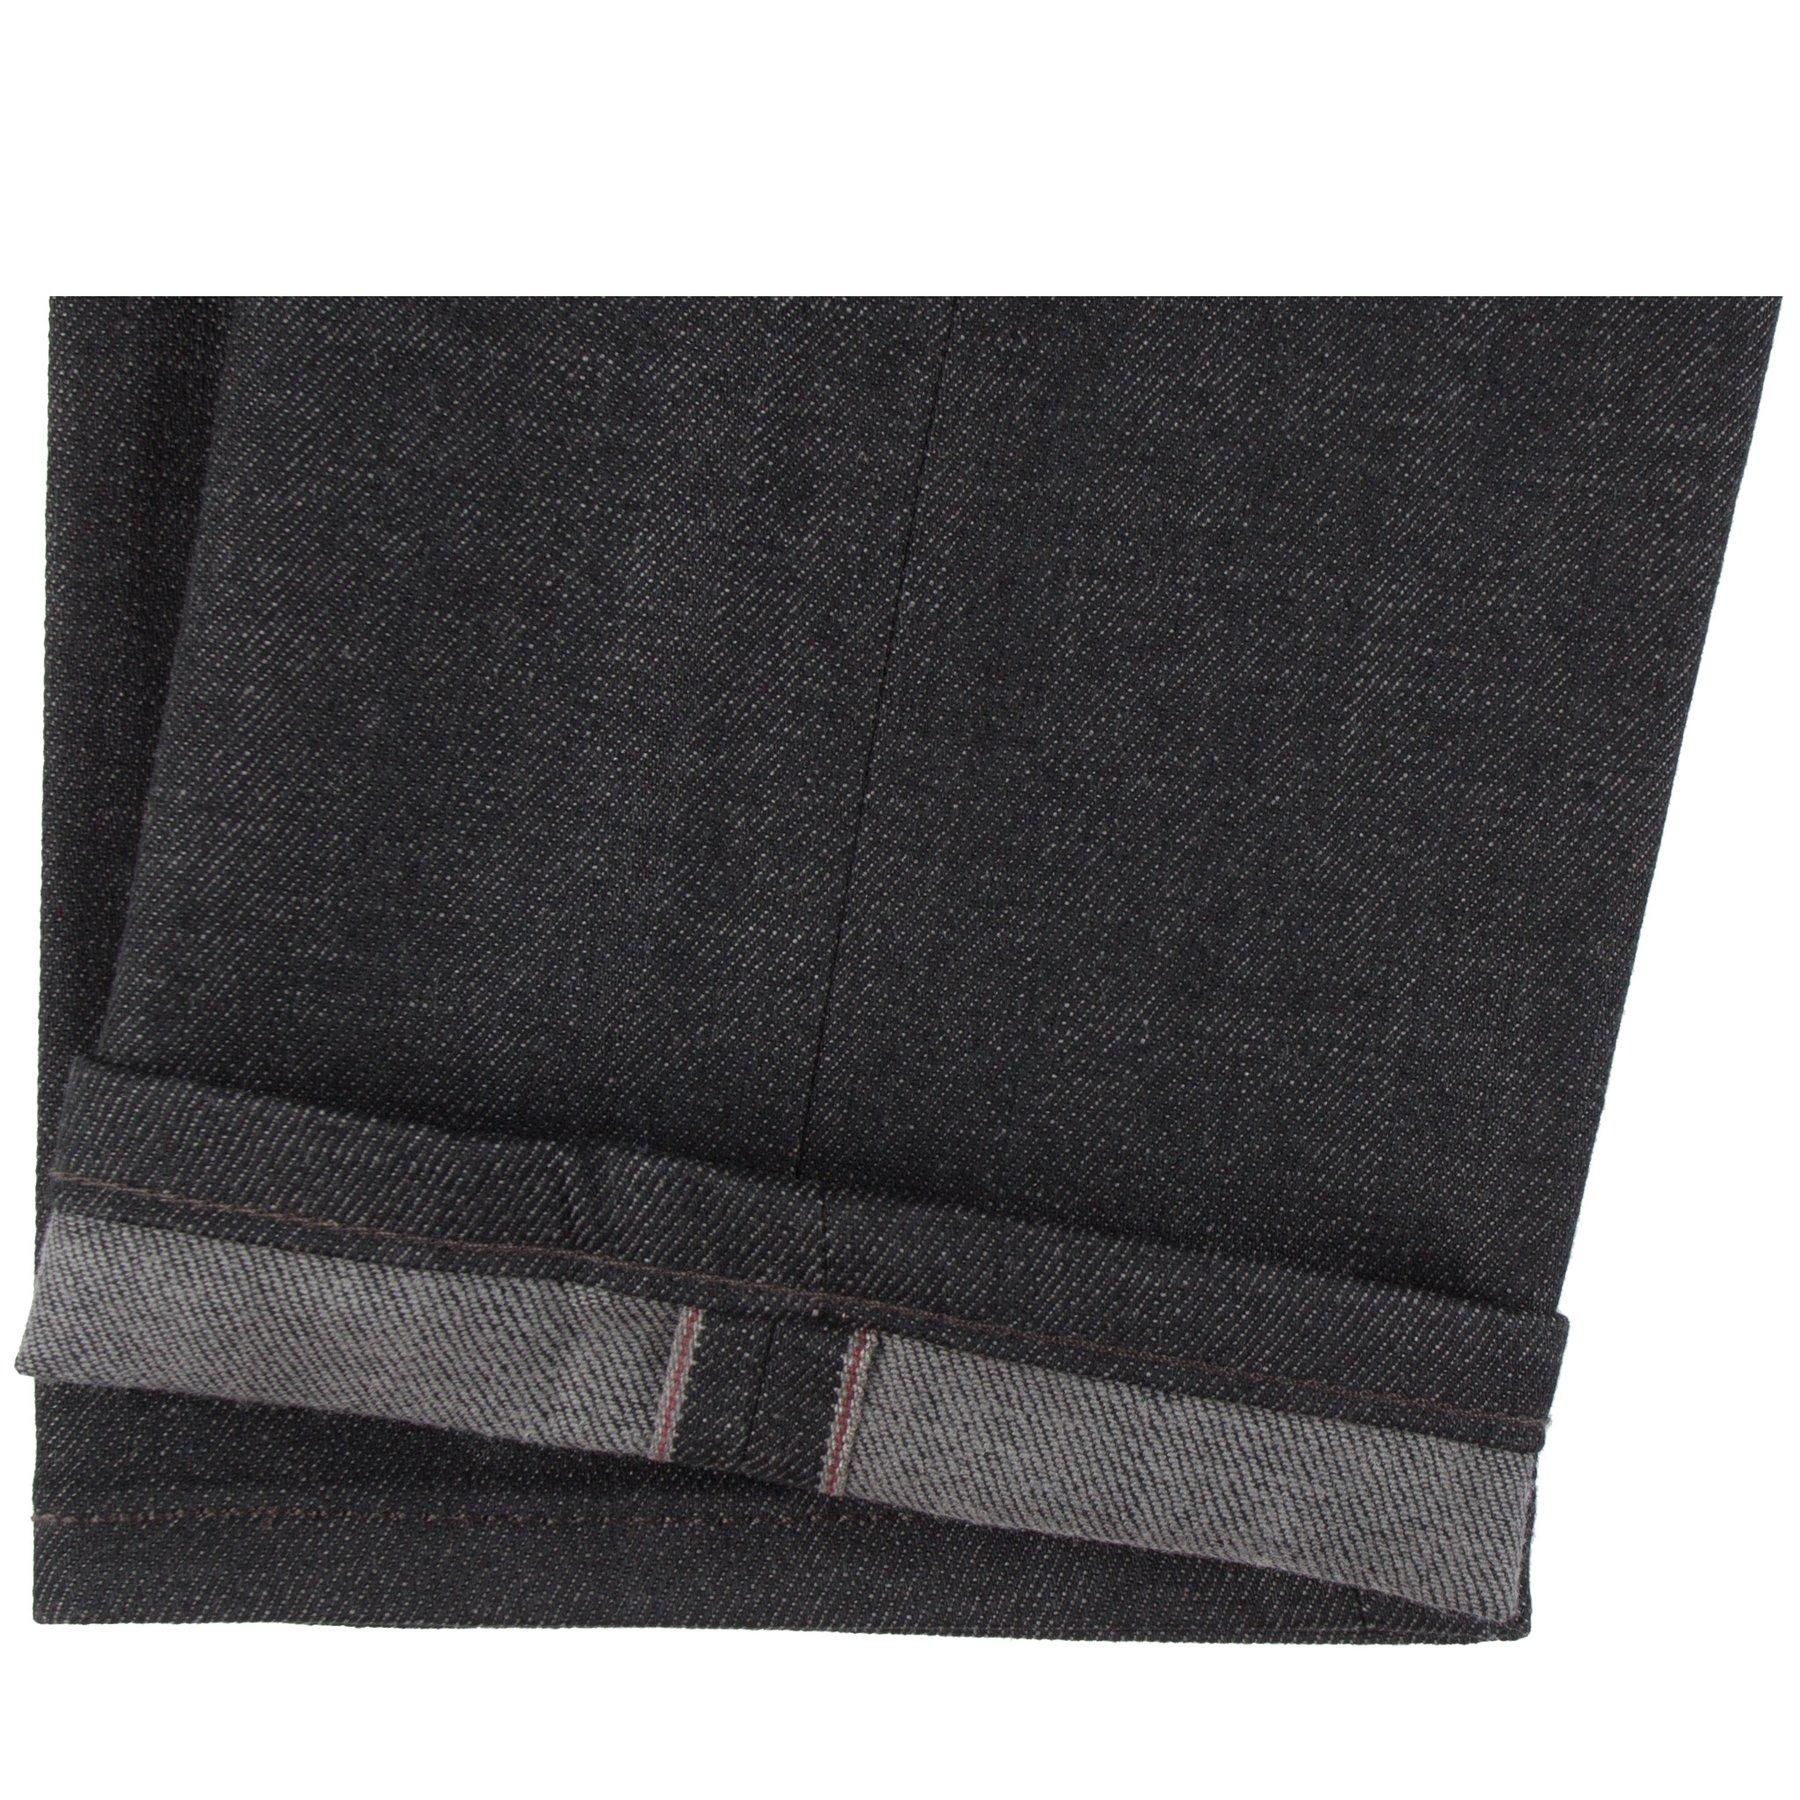 Black x Grey Stretch Selvedge Jeans Hem